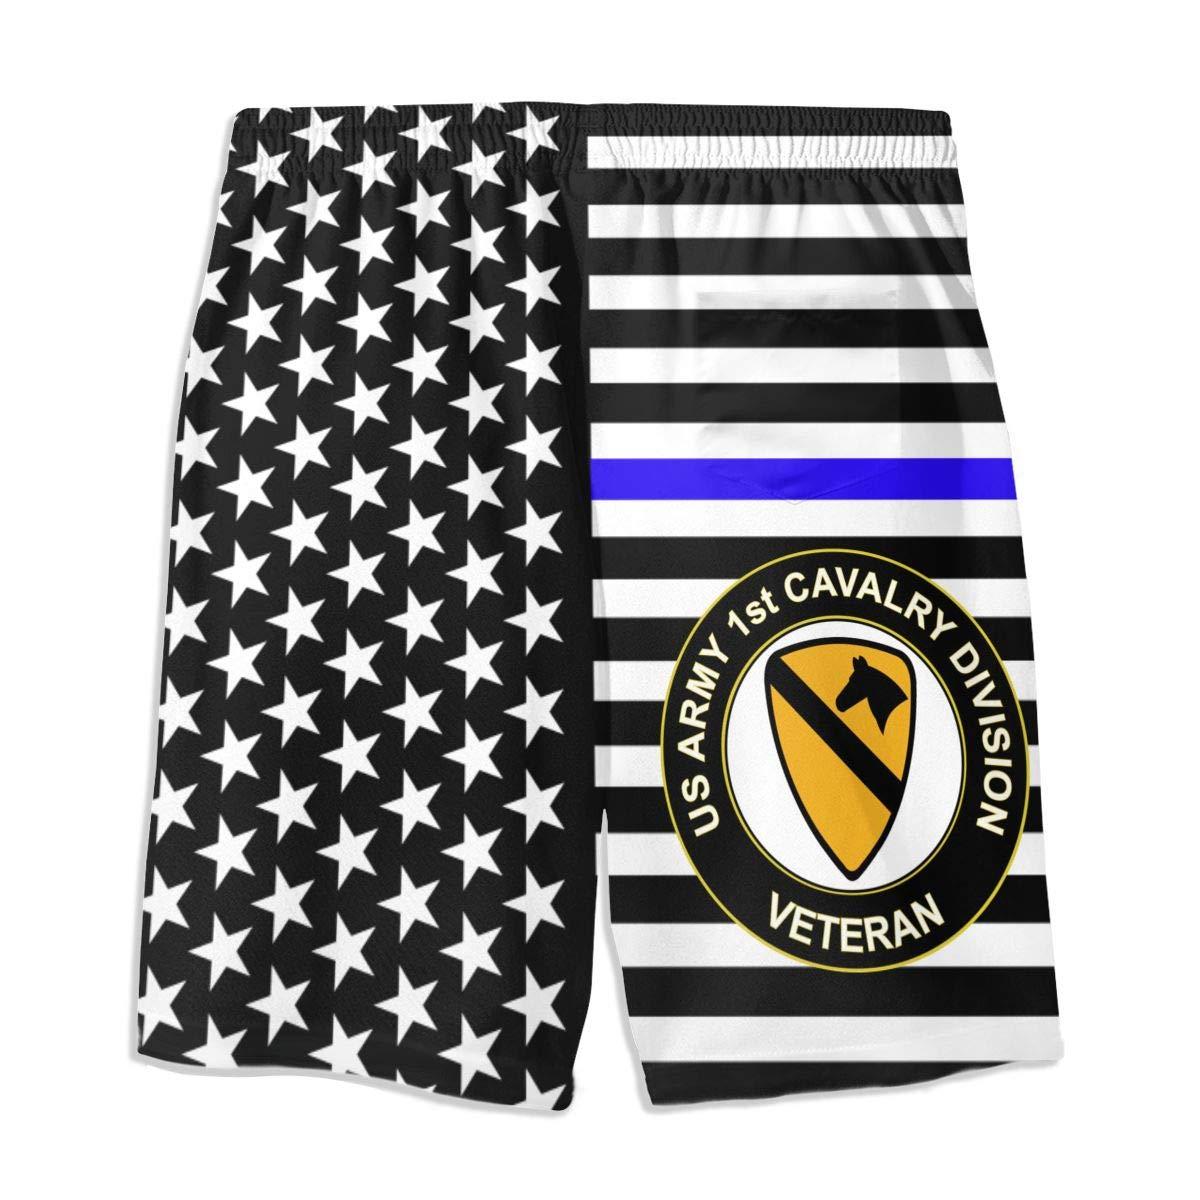 US Army Veteran 1st Cavalry Division Men Summer Casual Shorts,Beach Shorts Pocket Shorts